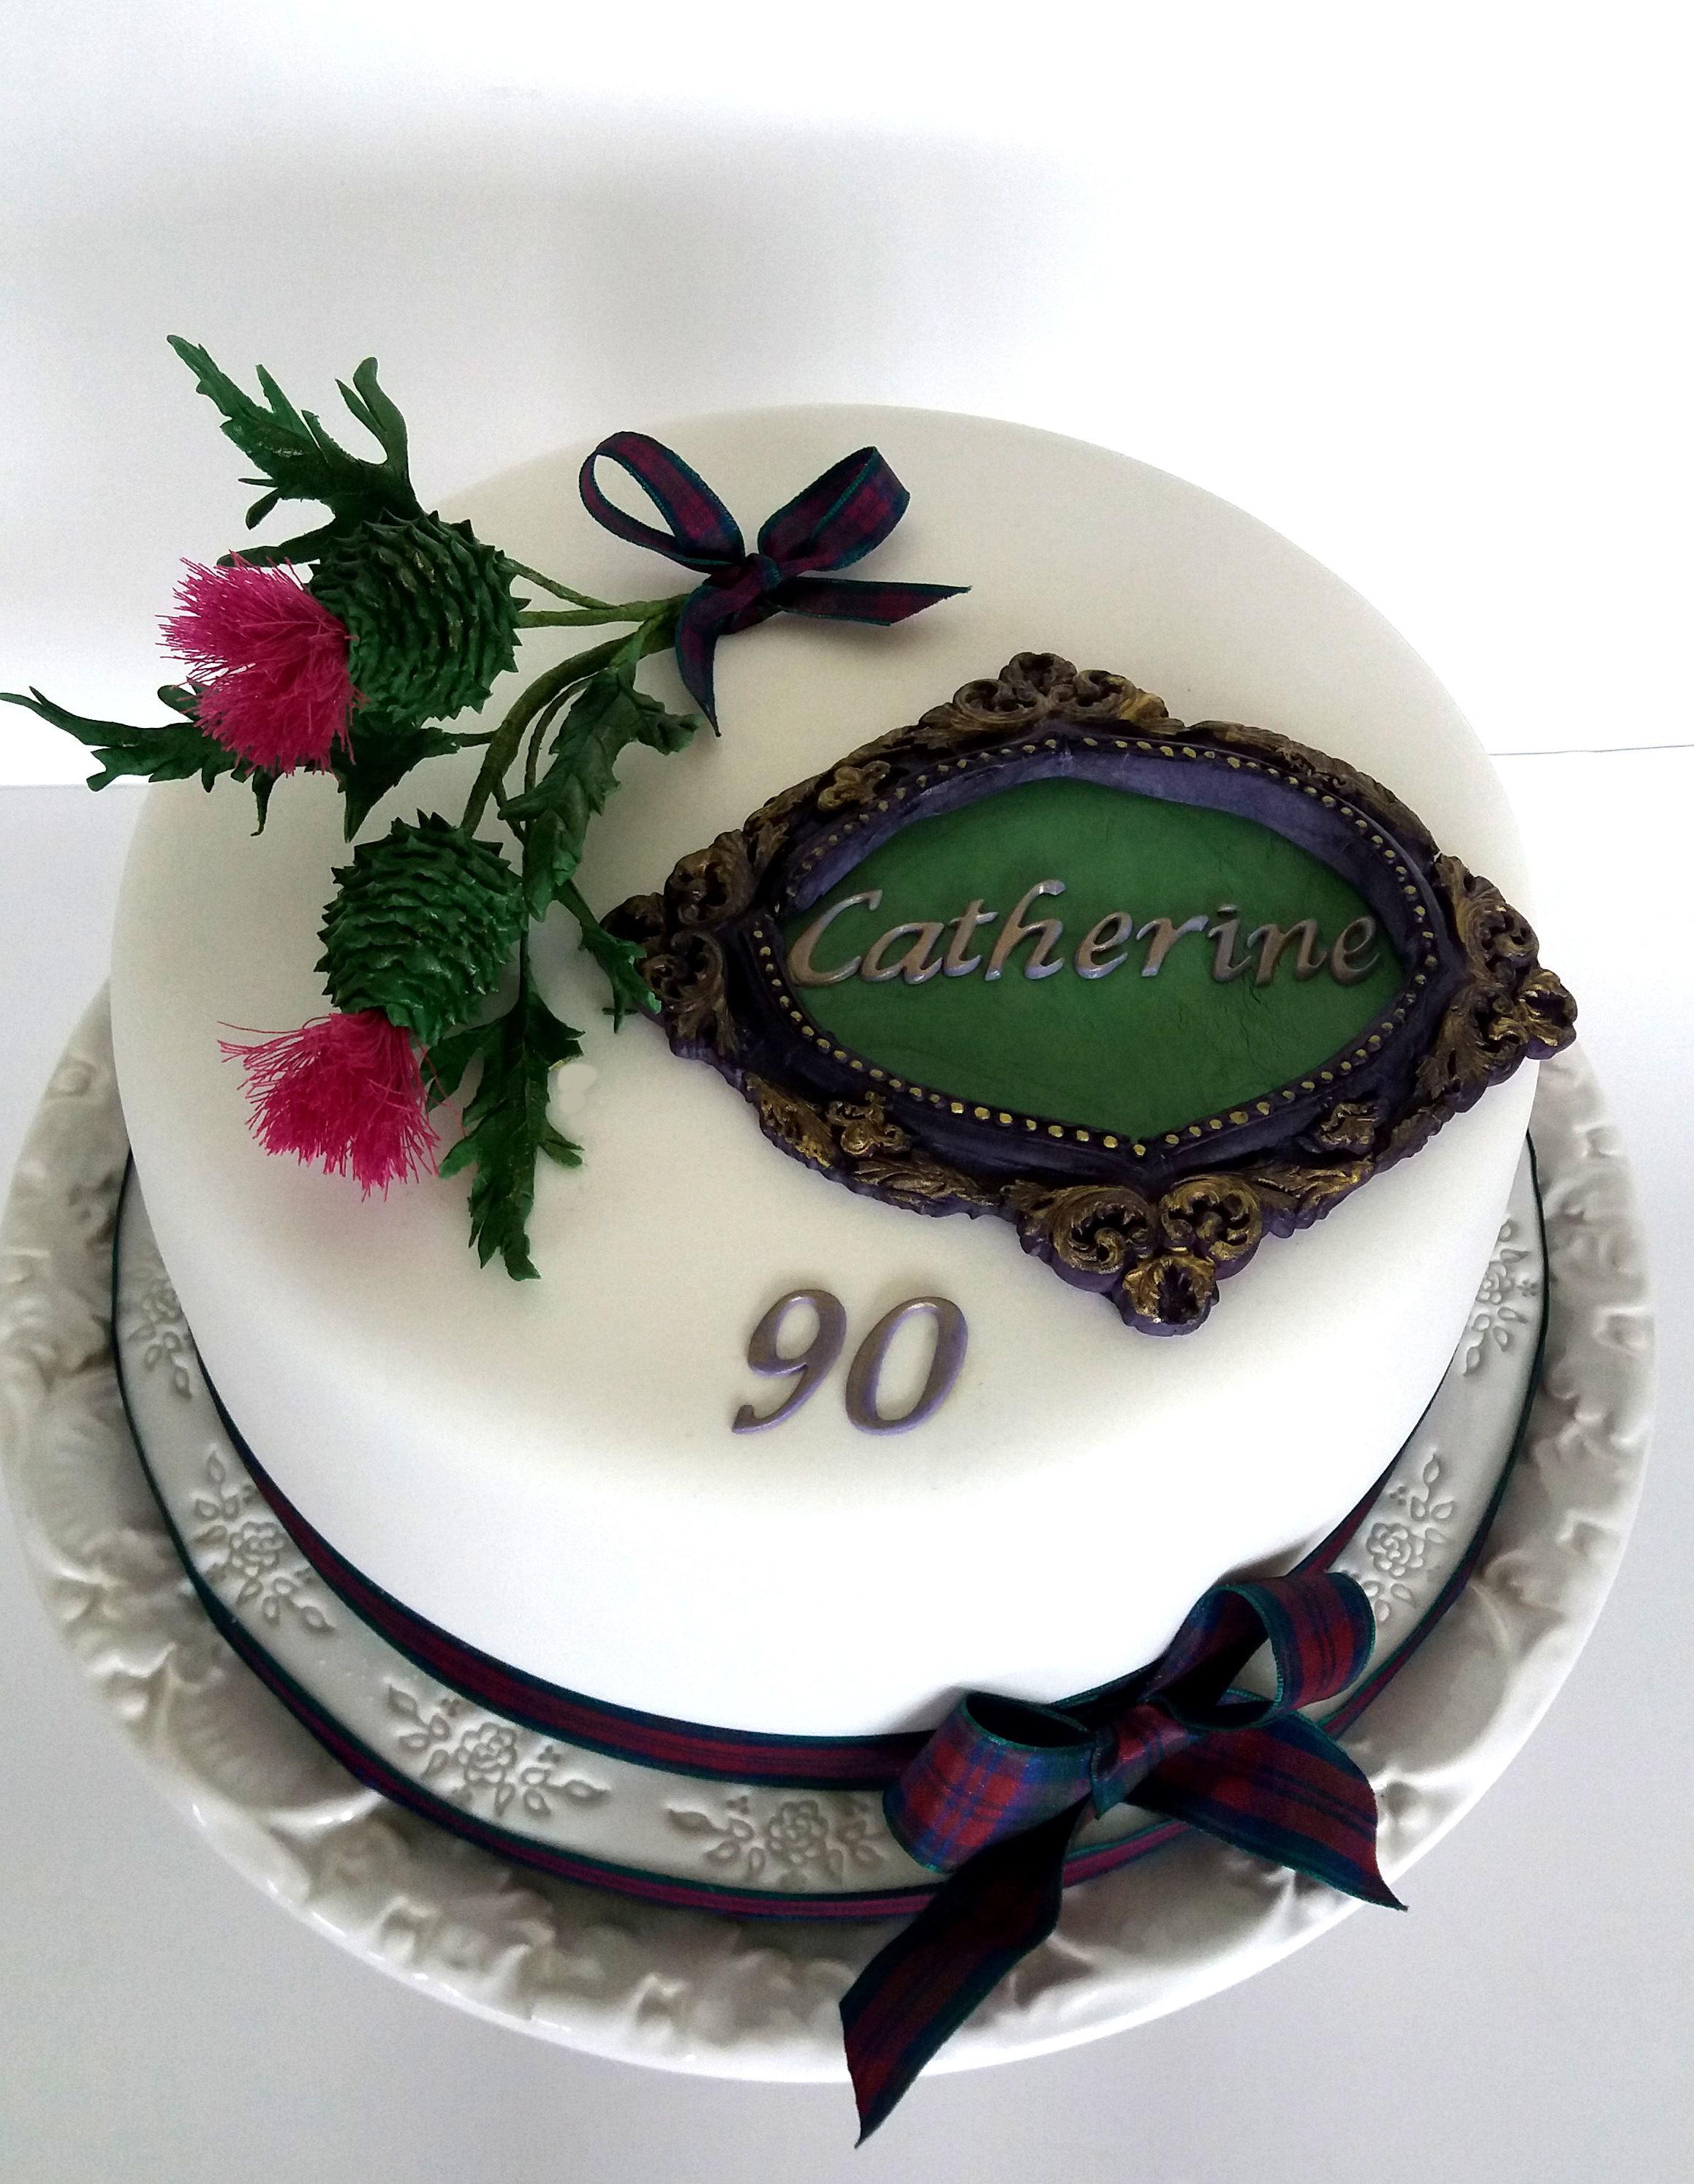 scottish cake.jpg